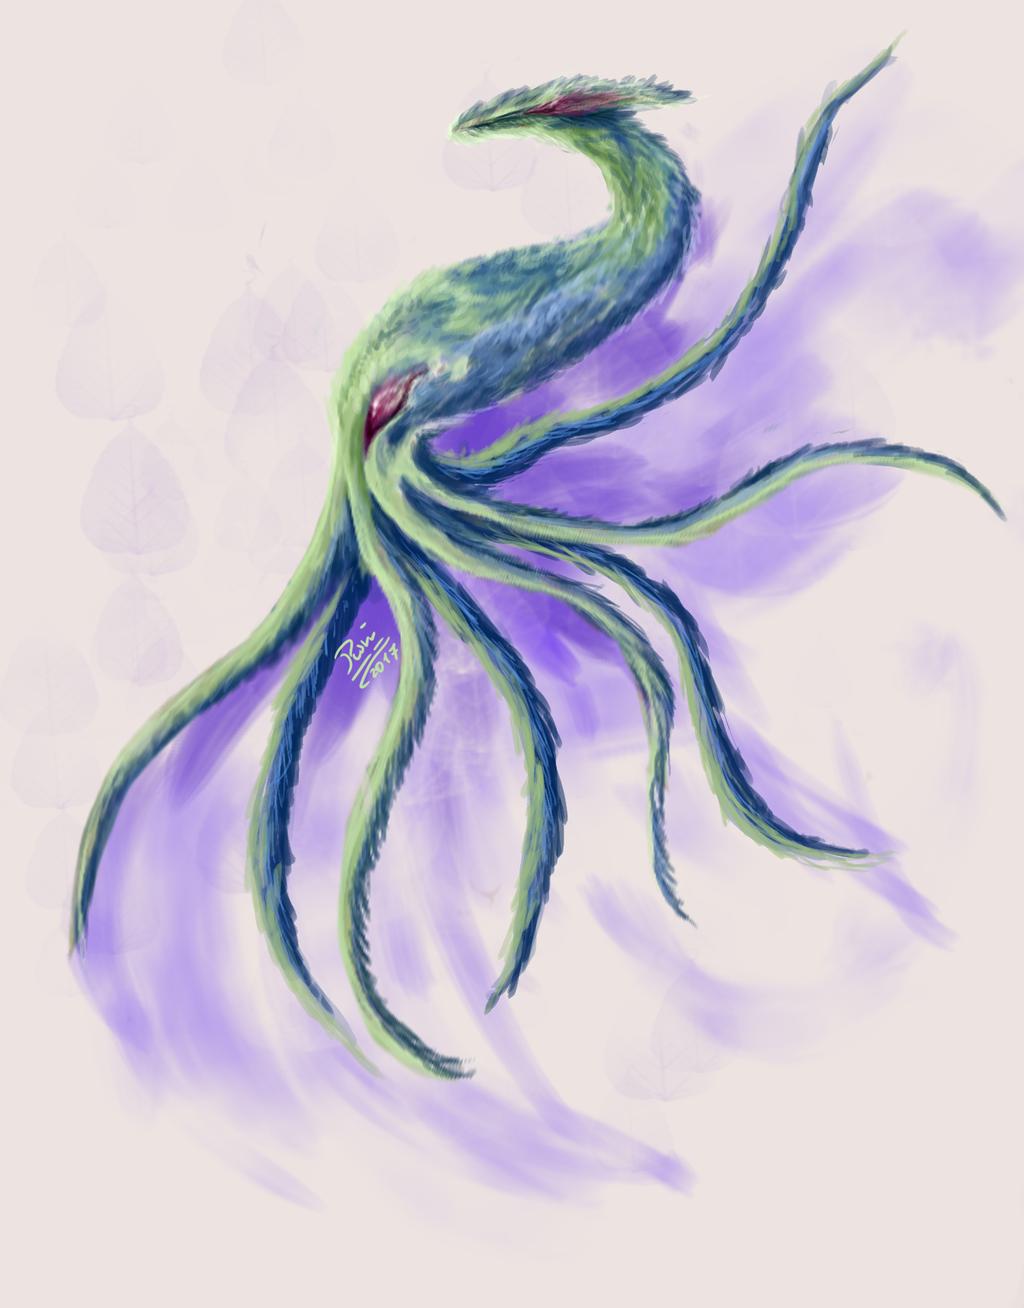 Fuzzy octopus